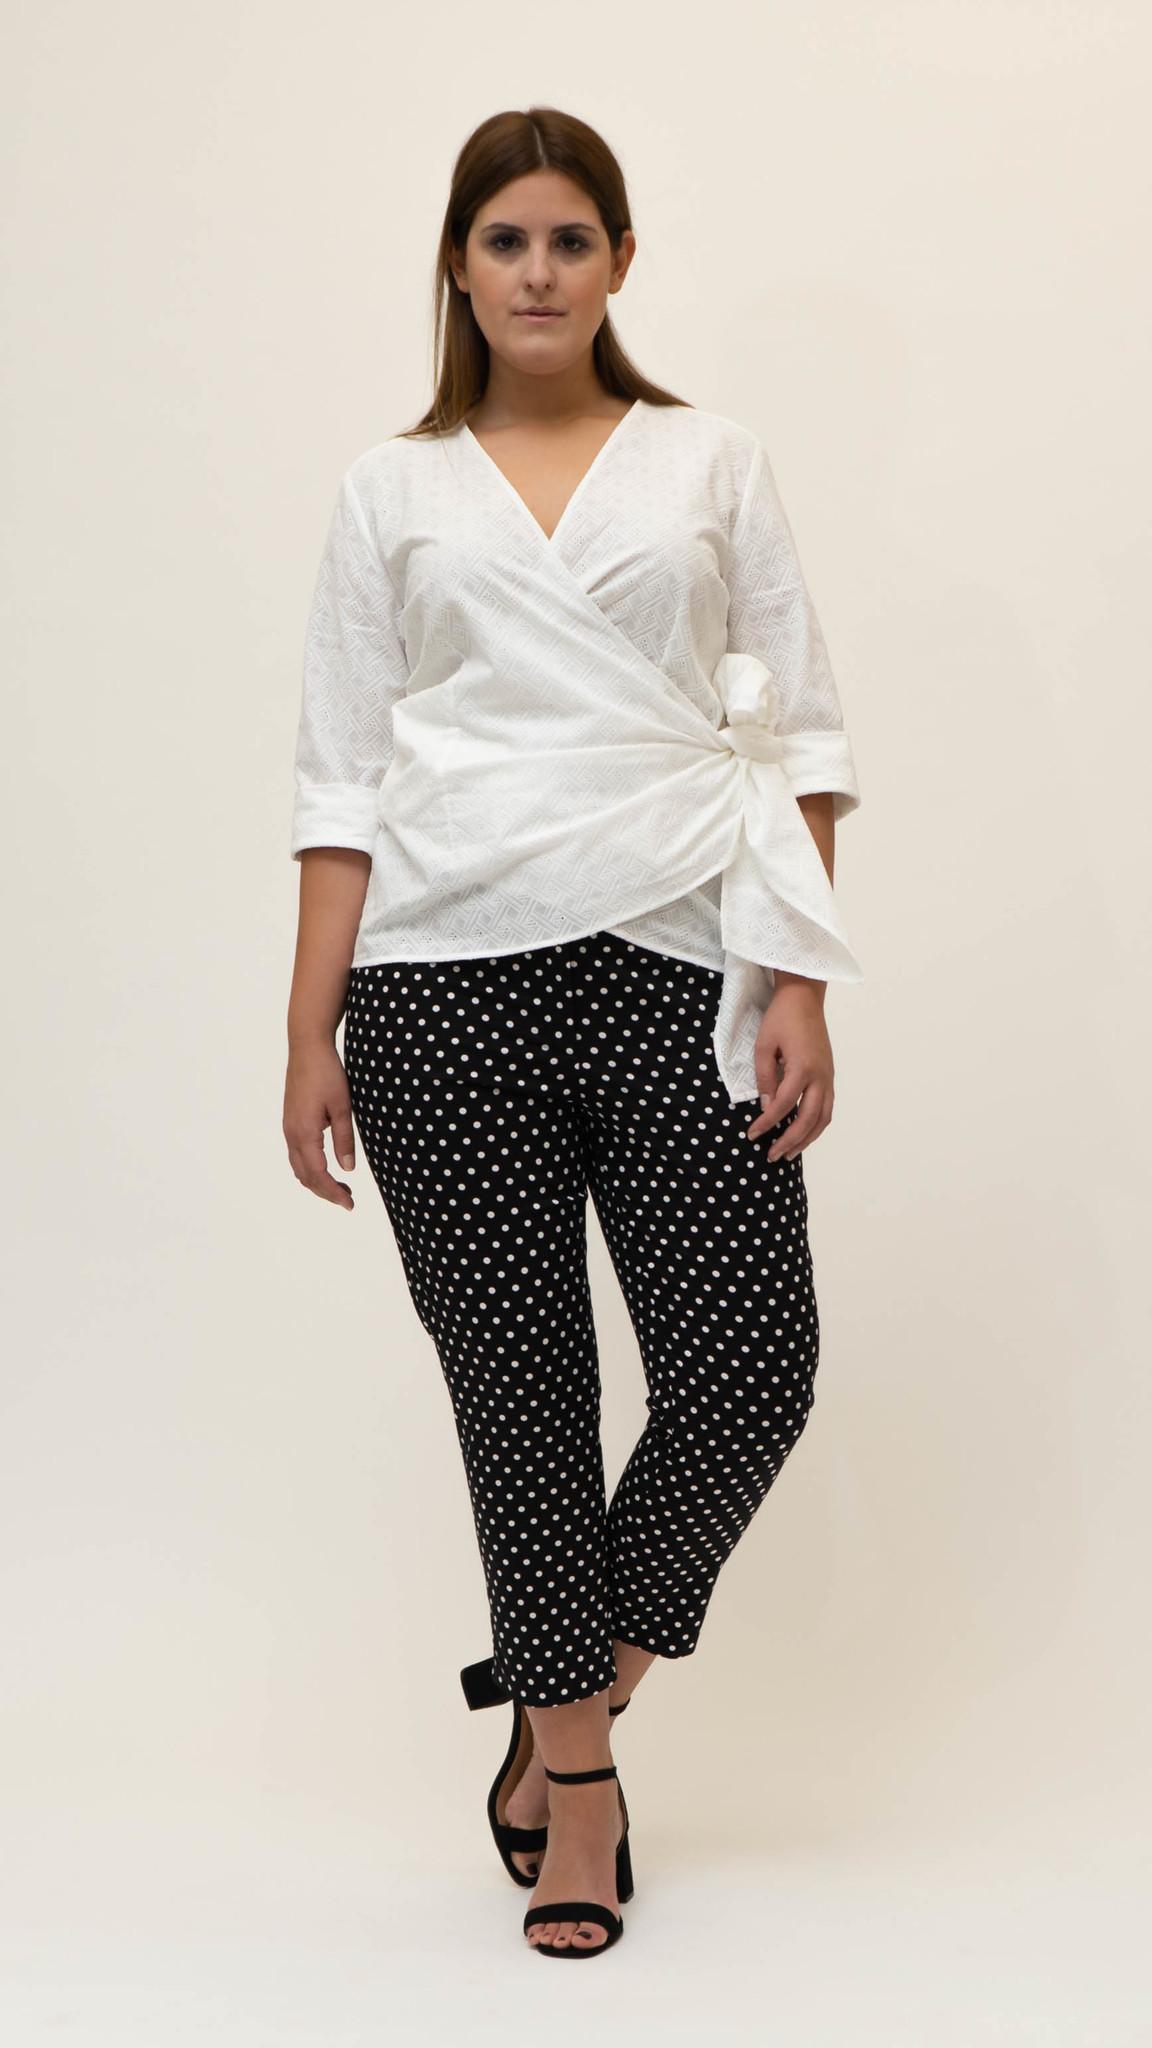 CAPRI Trouser in Cotton stretch-3